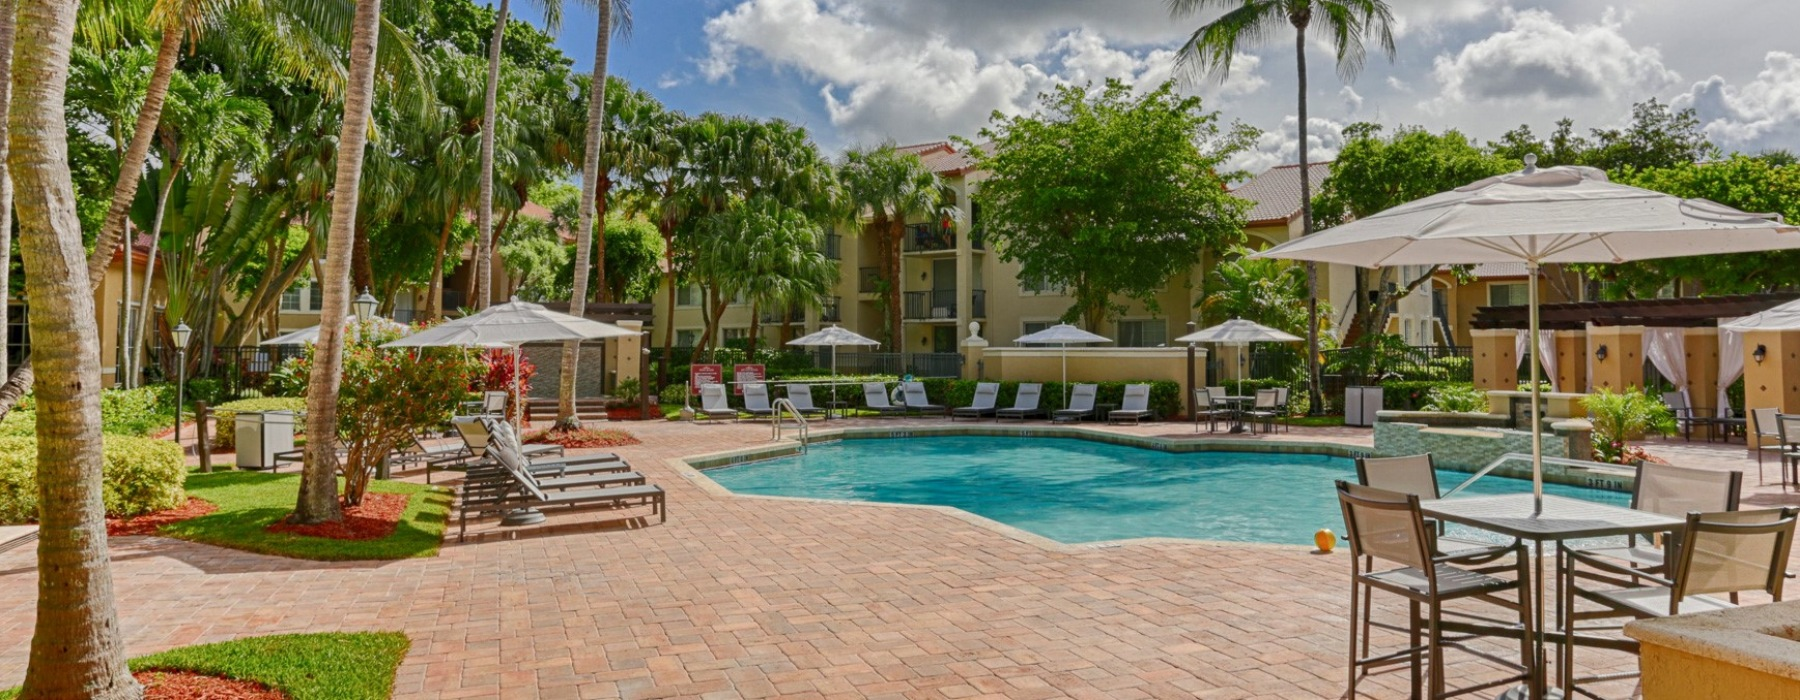 The Stratford Apartments in Miami